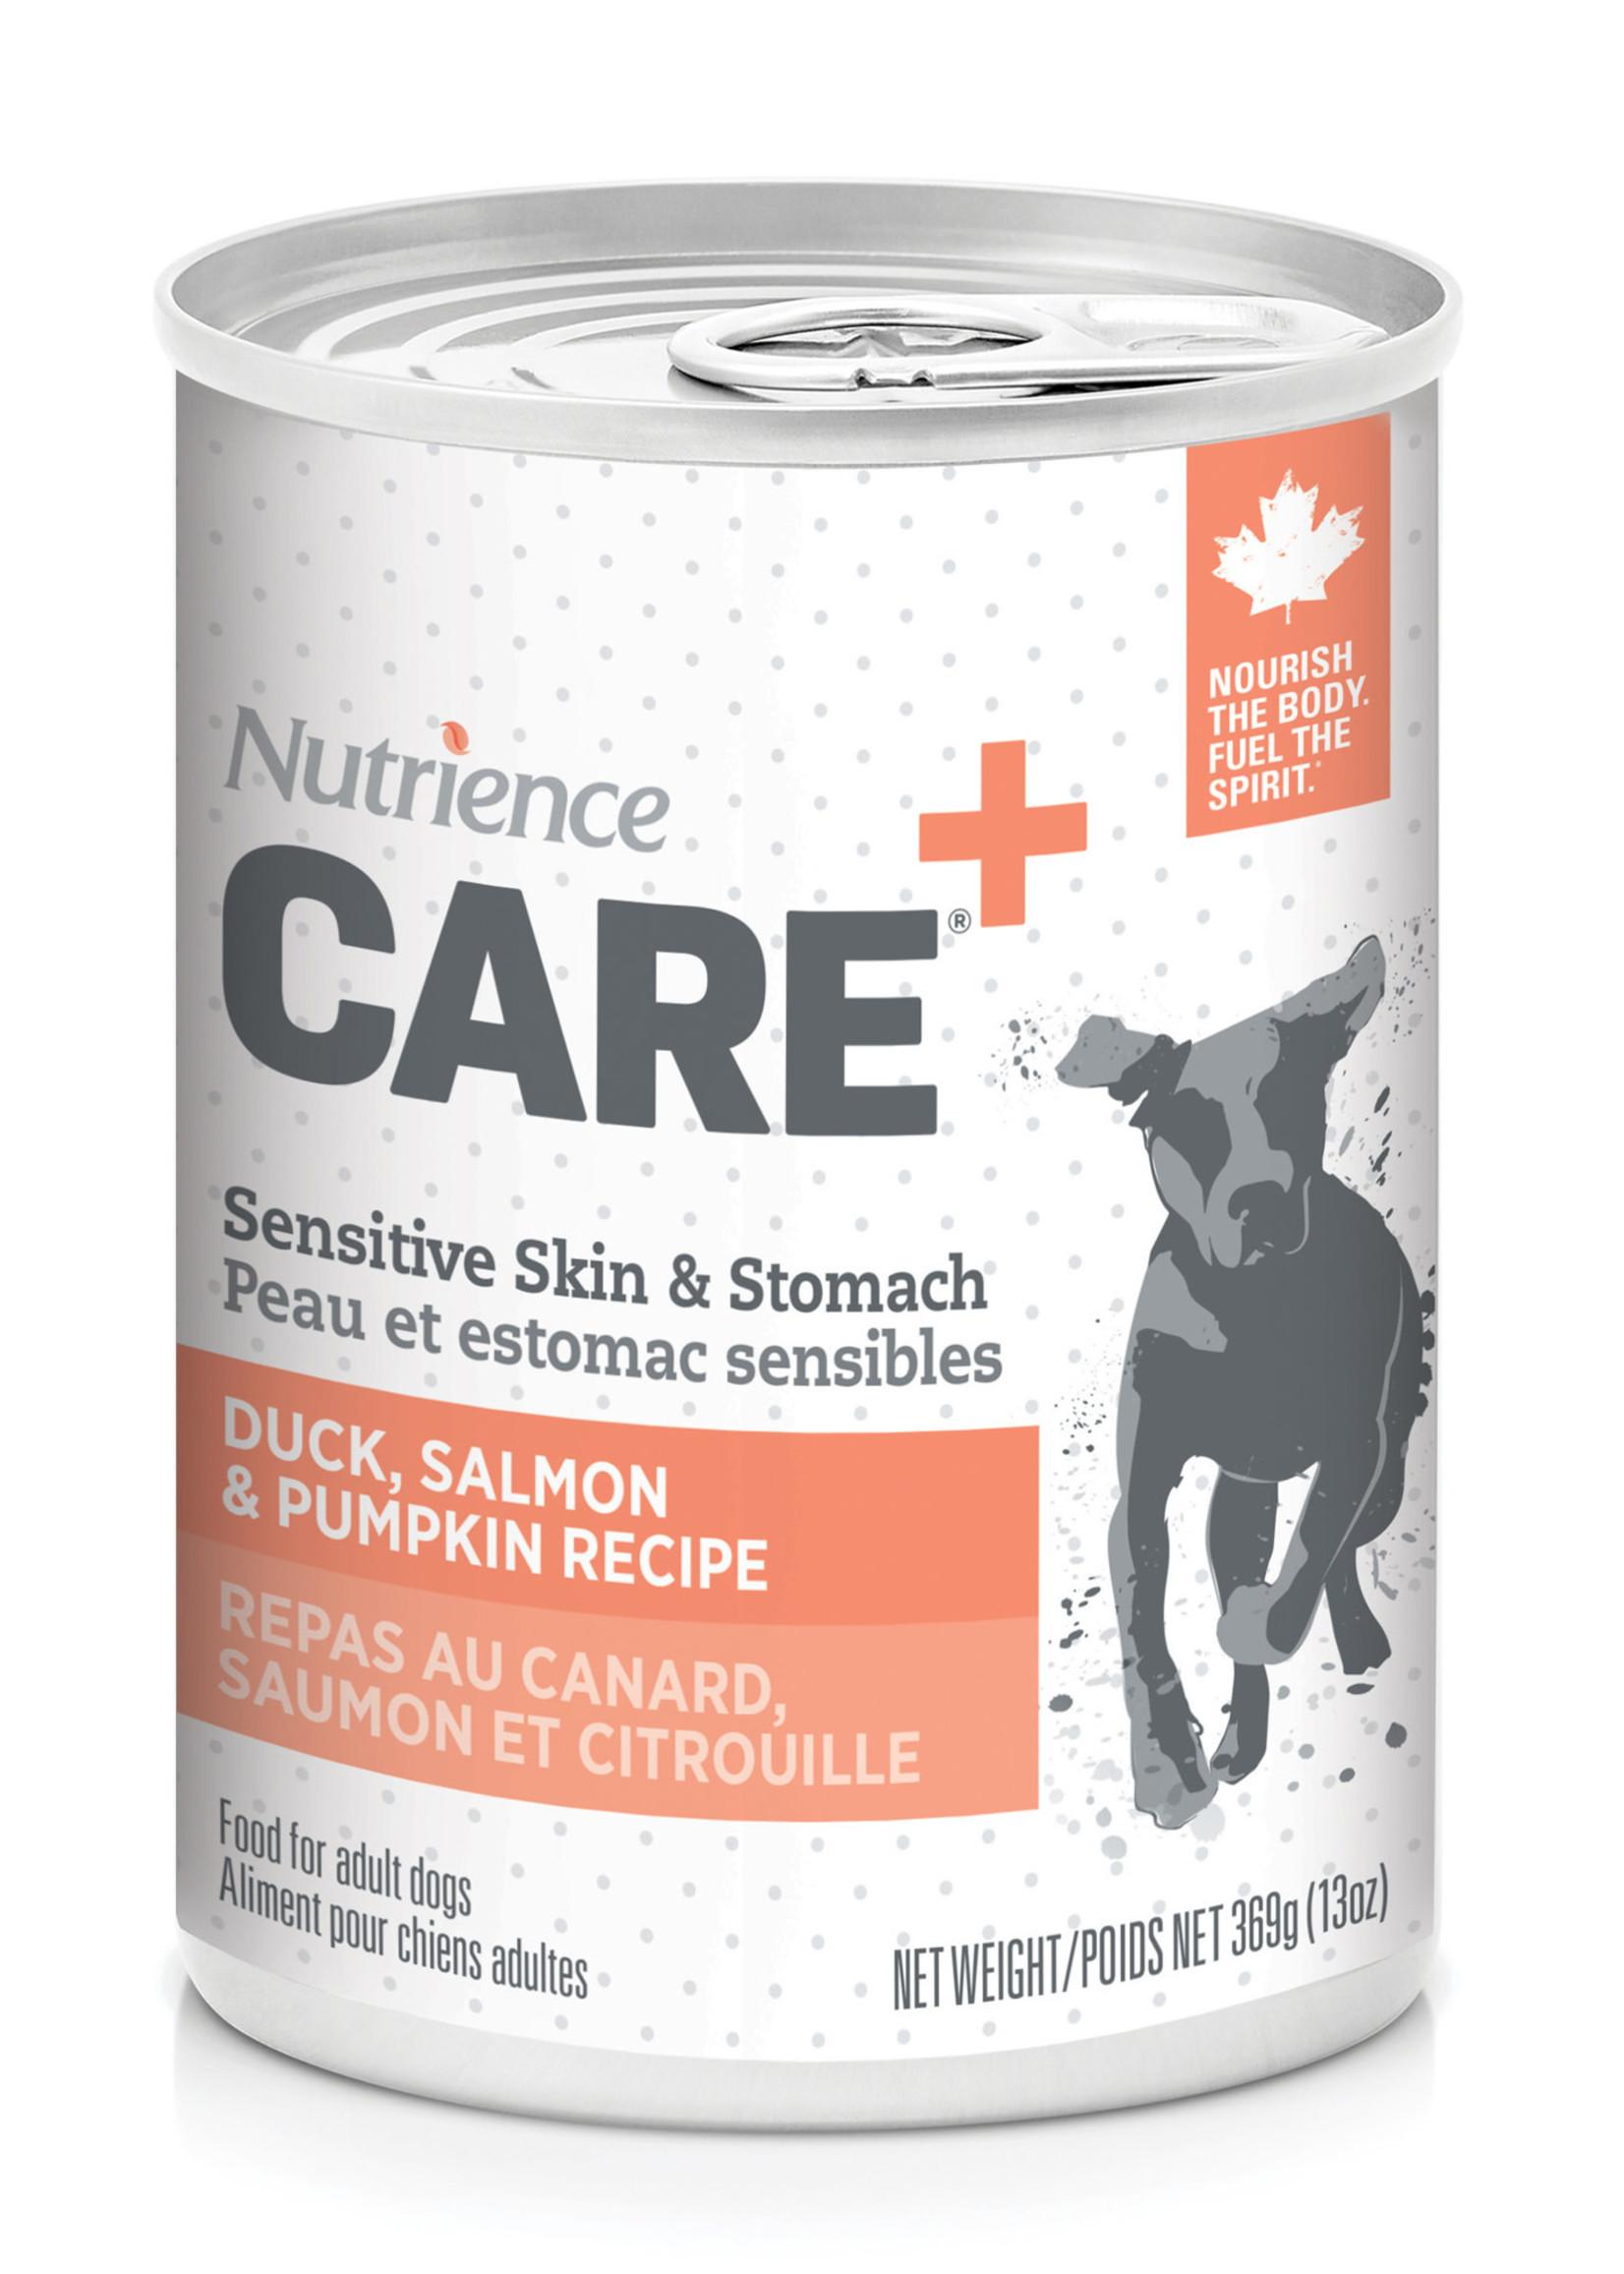 Nutrience Care Dog Sensitive Skin, & Stomach - Duck, Salmon - 369g